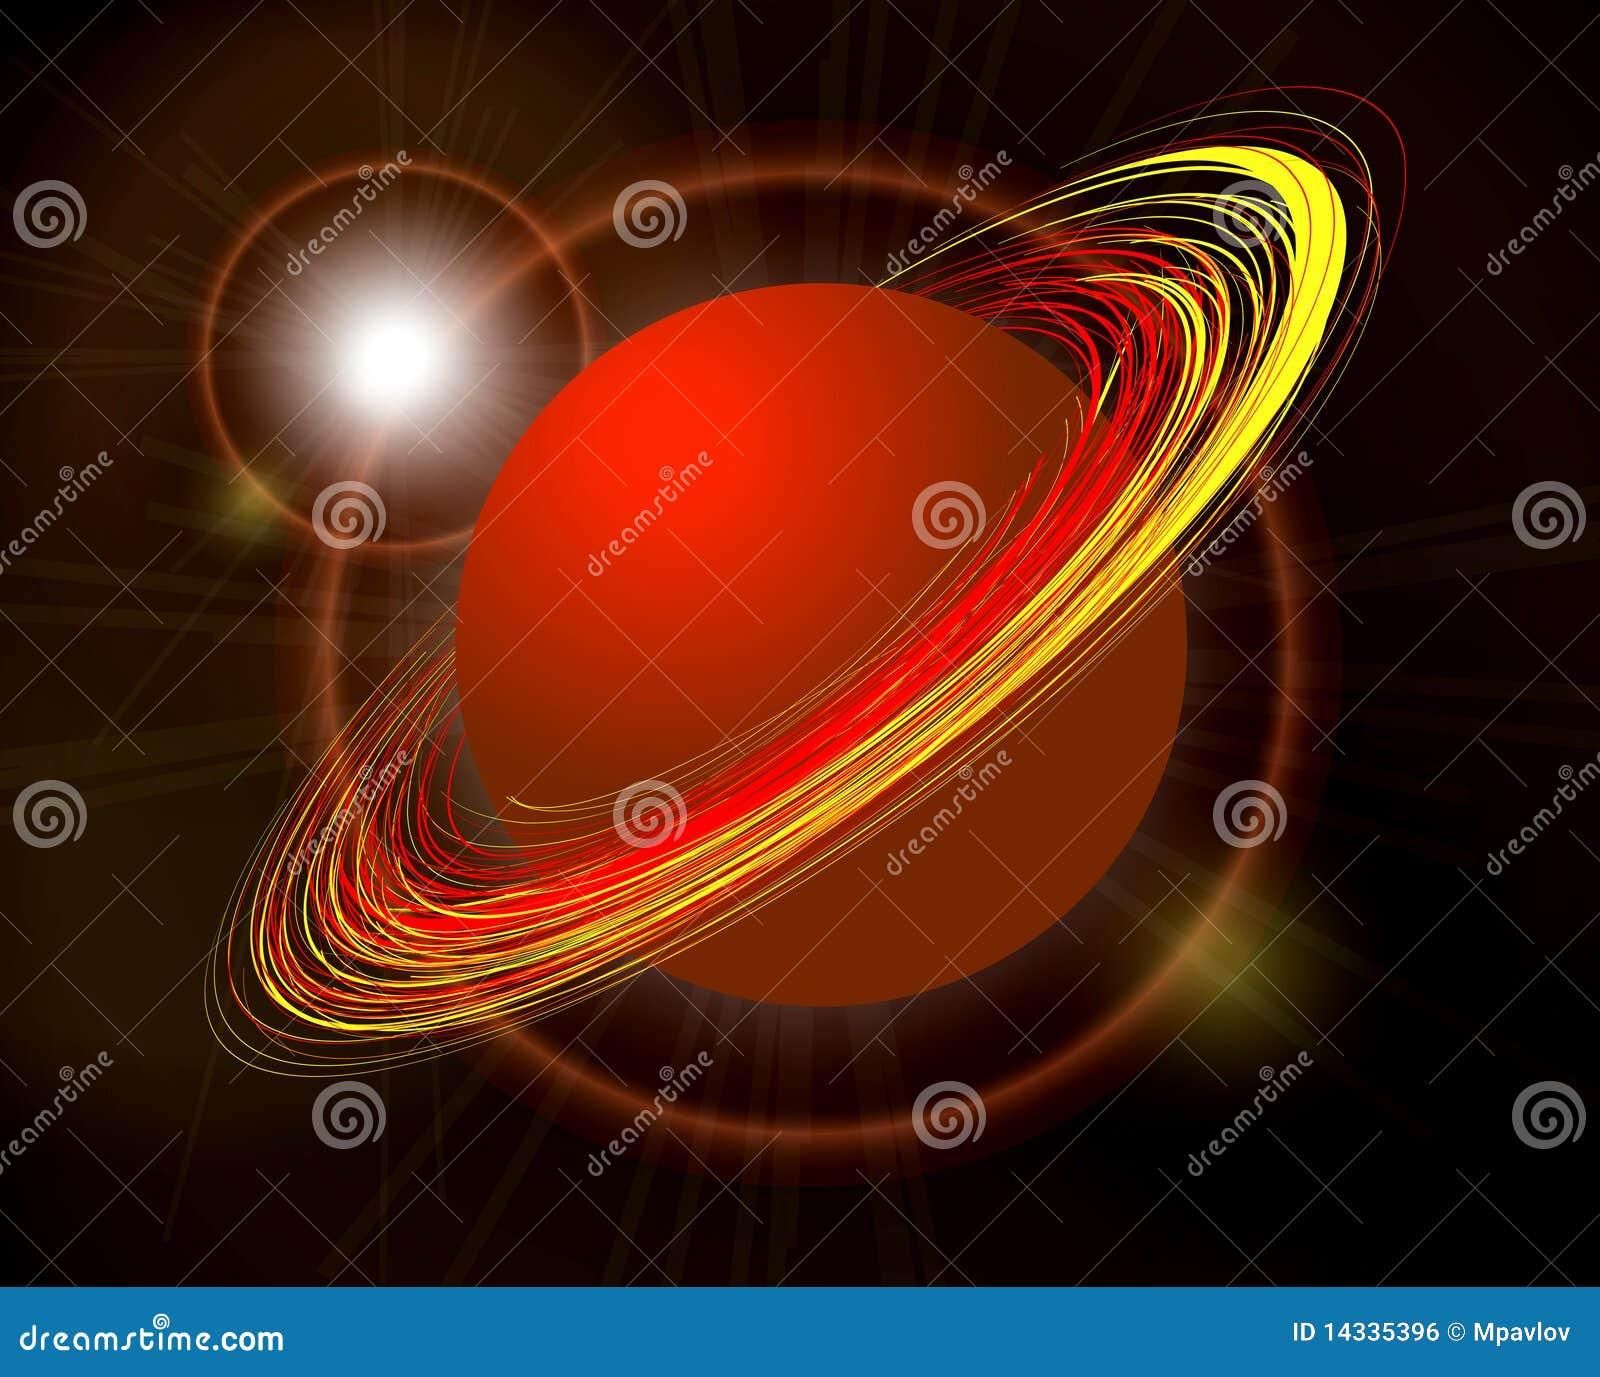 saturn planet illustration on black royalty free stock image